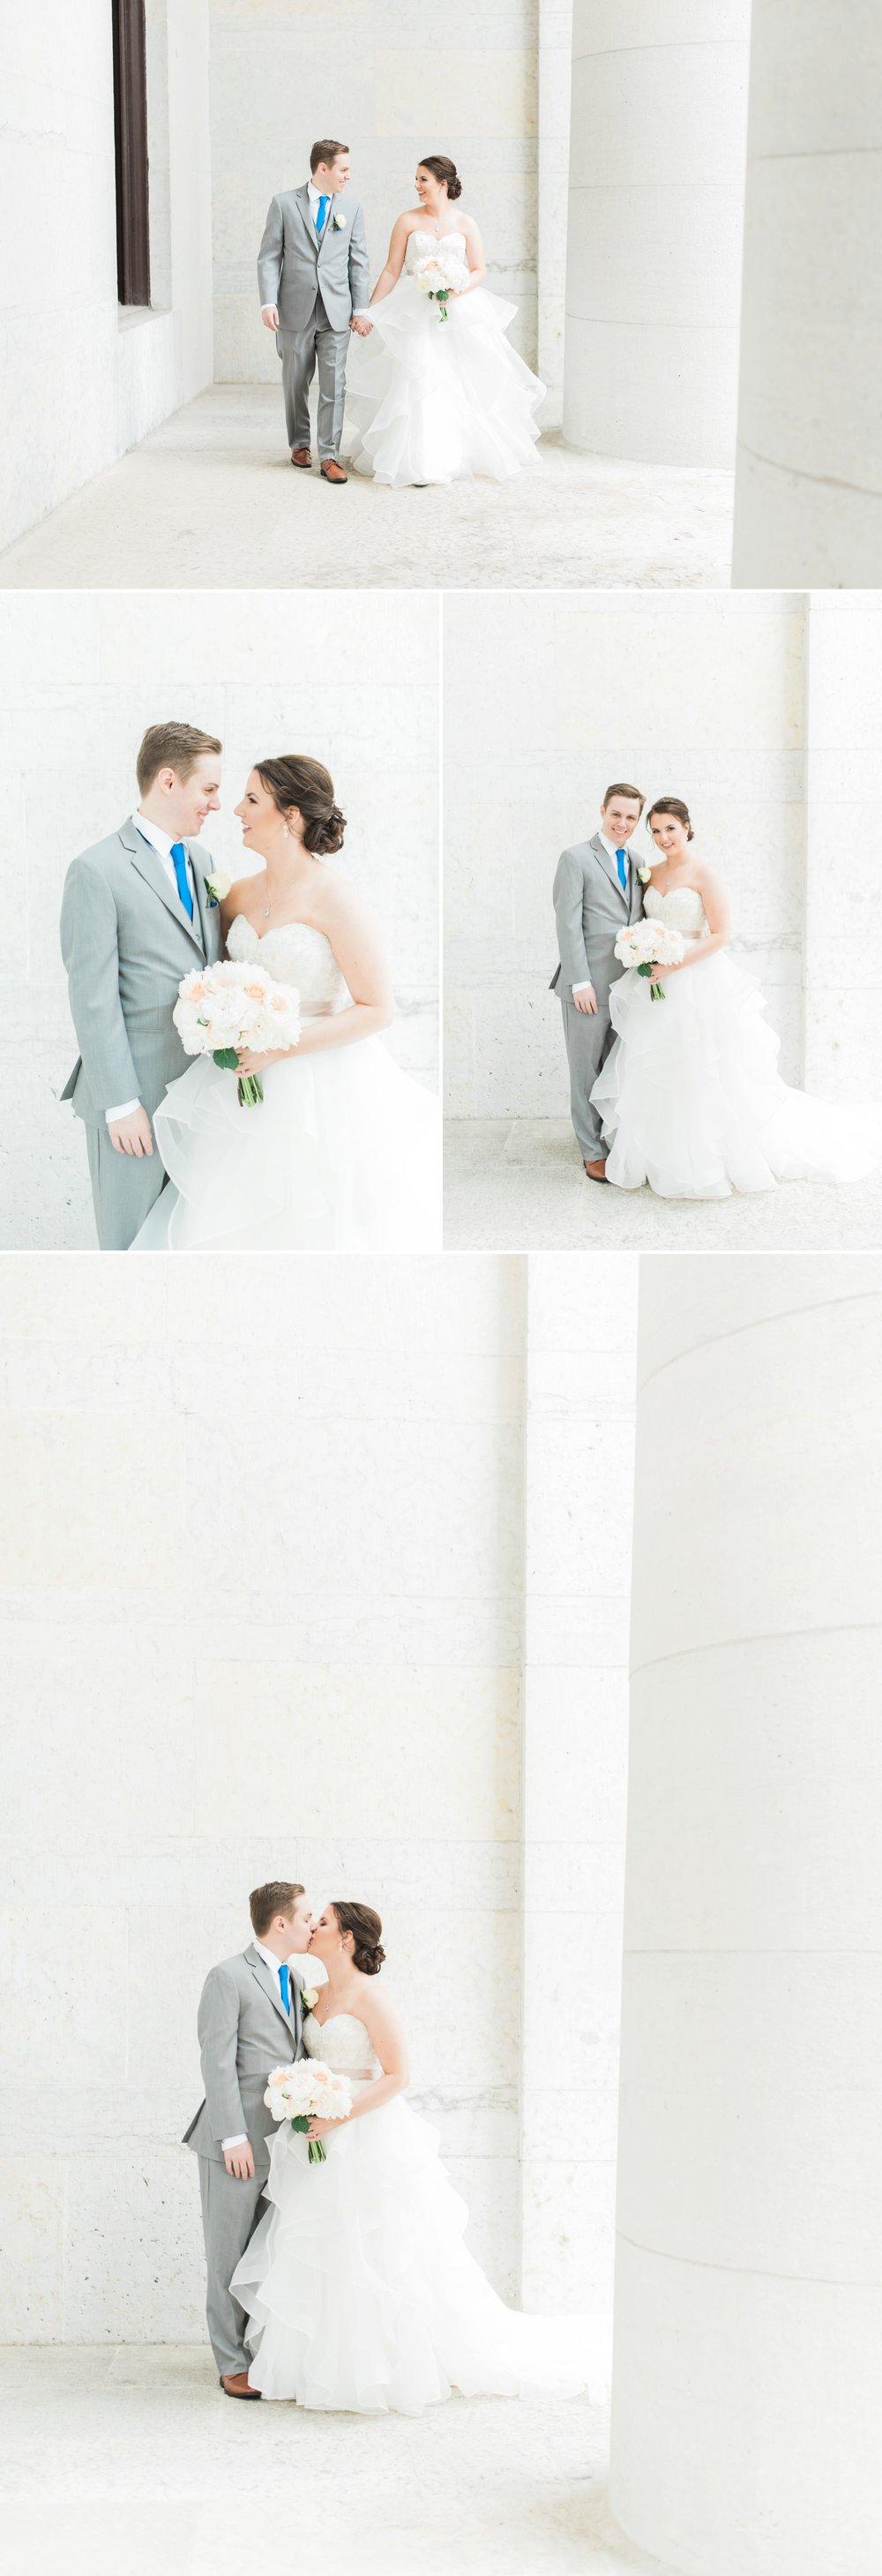 the-vault-columbus-ohio-wedding-emily-chris_0042.jpg